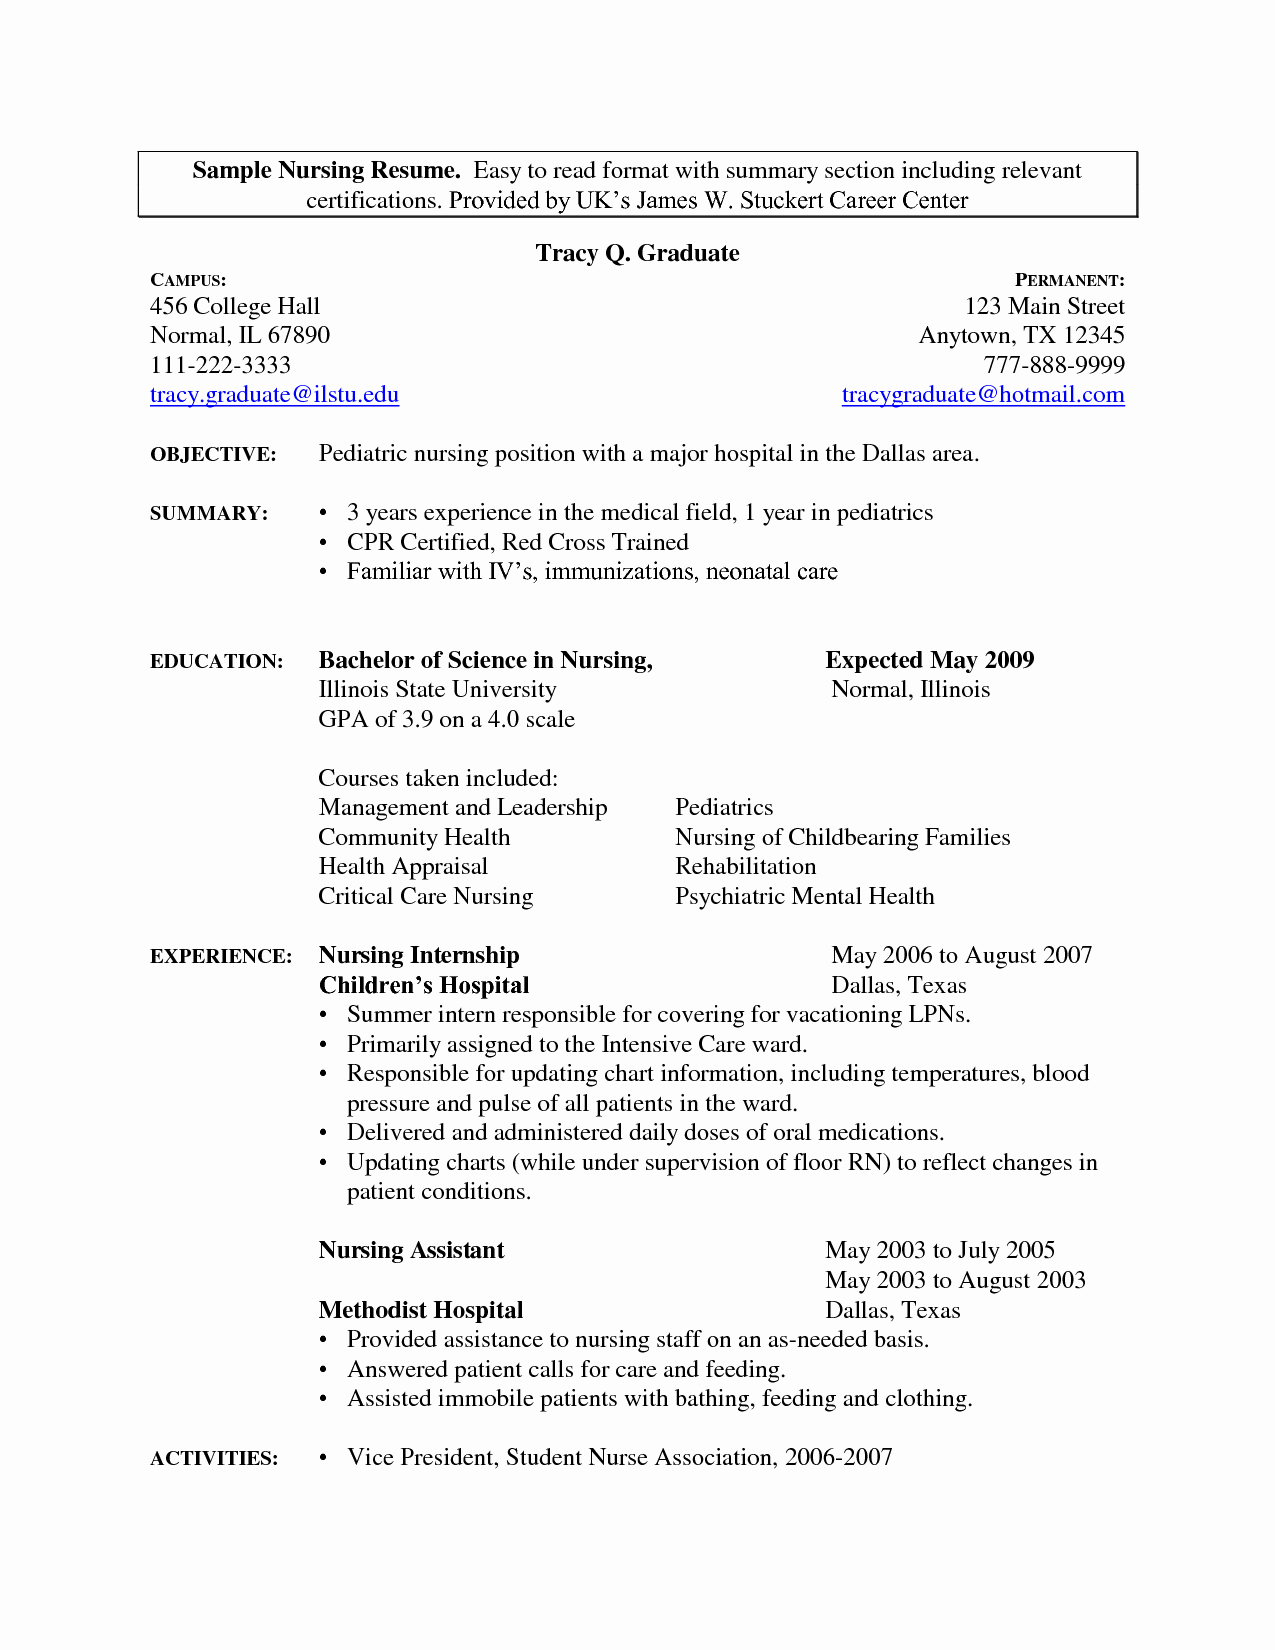 Entry Level Dental assistant Resume Fresh Admin Resume Template Entry Level Essay Medical Office Objective Sample Graduate assistantship